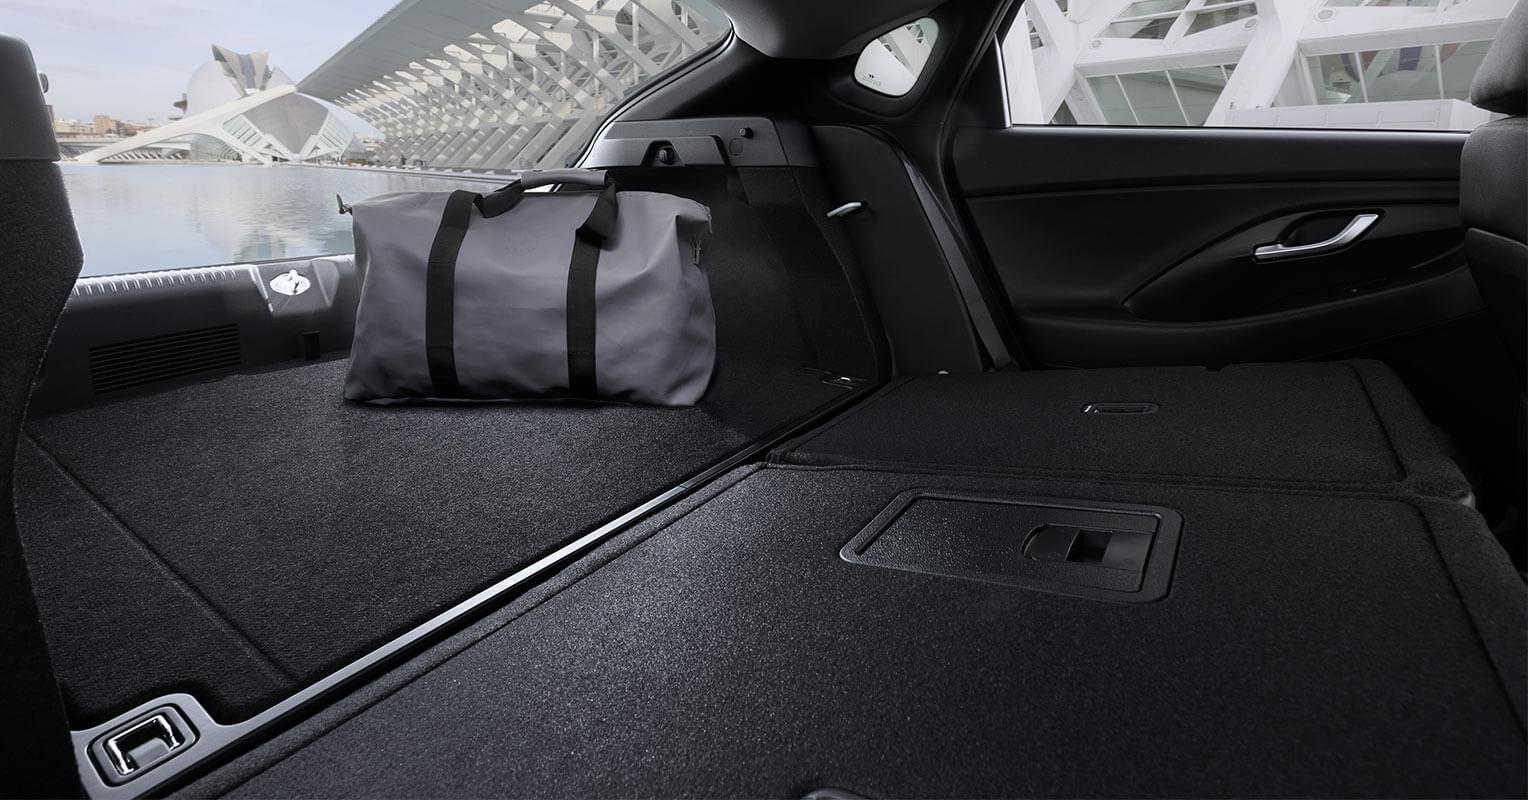 Maletero del Hyundai i30 Fastback